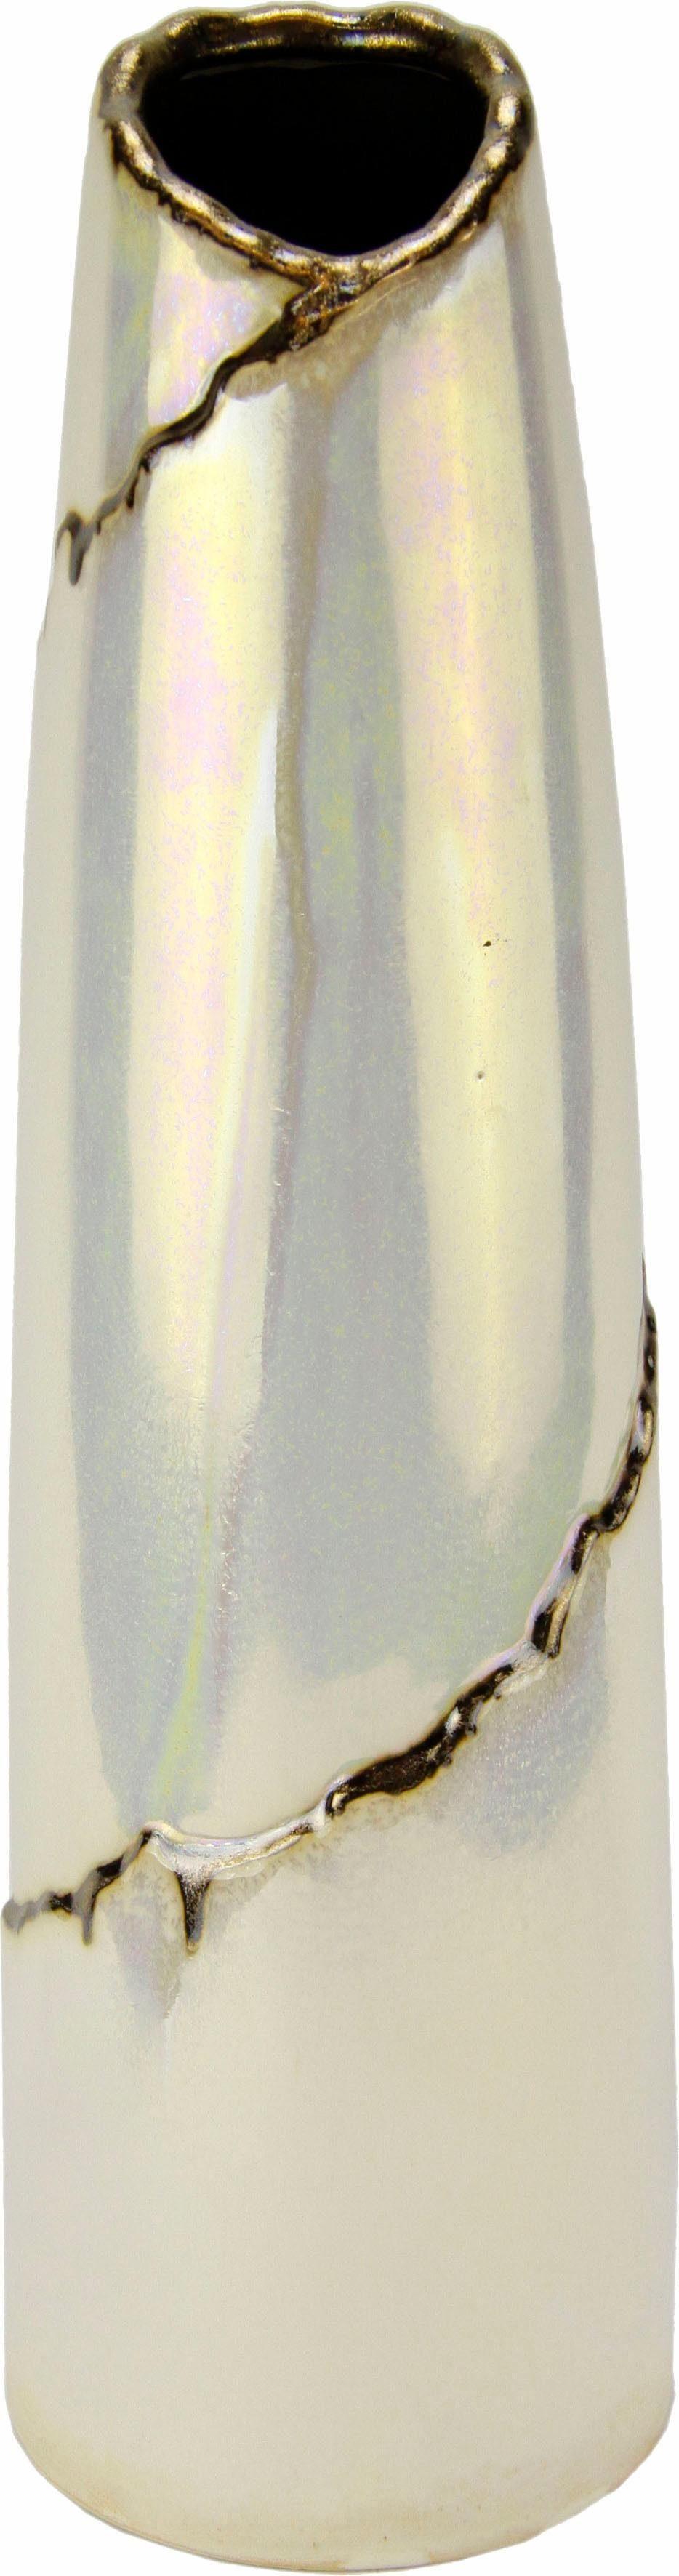 Home Affaire Keramik-Vase de Luxe 39/11cm